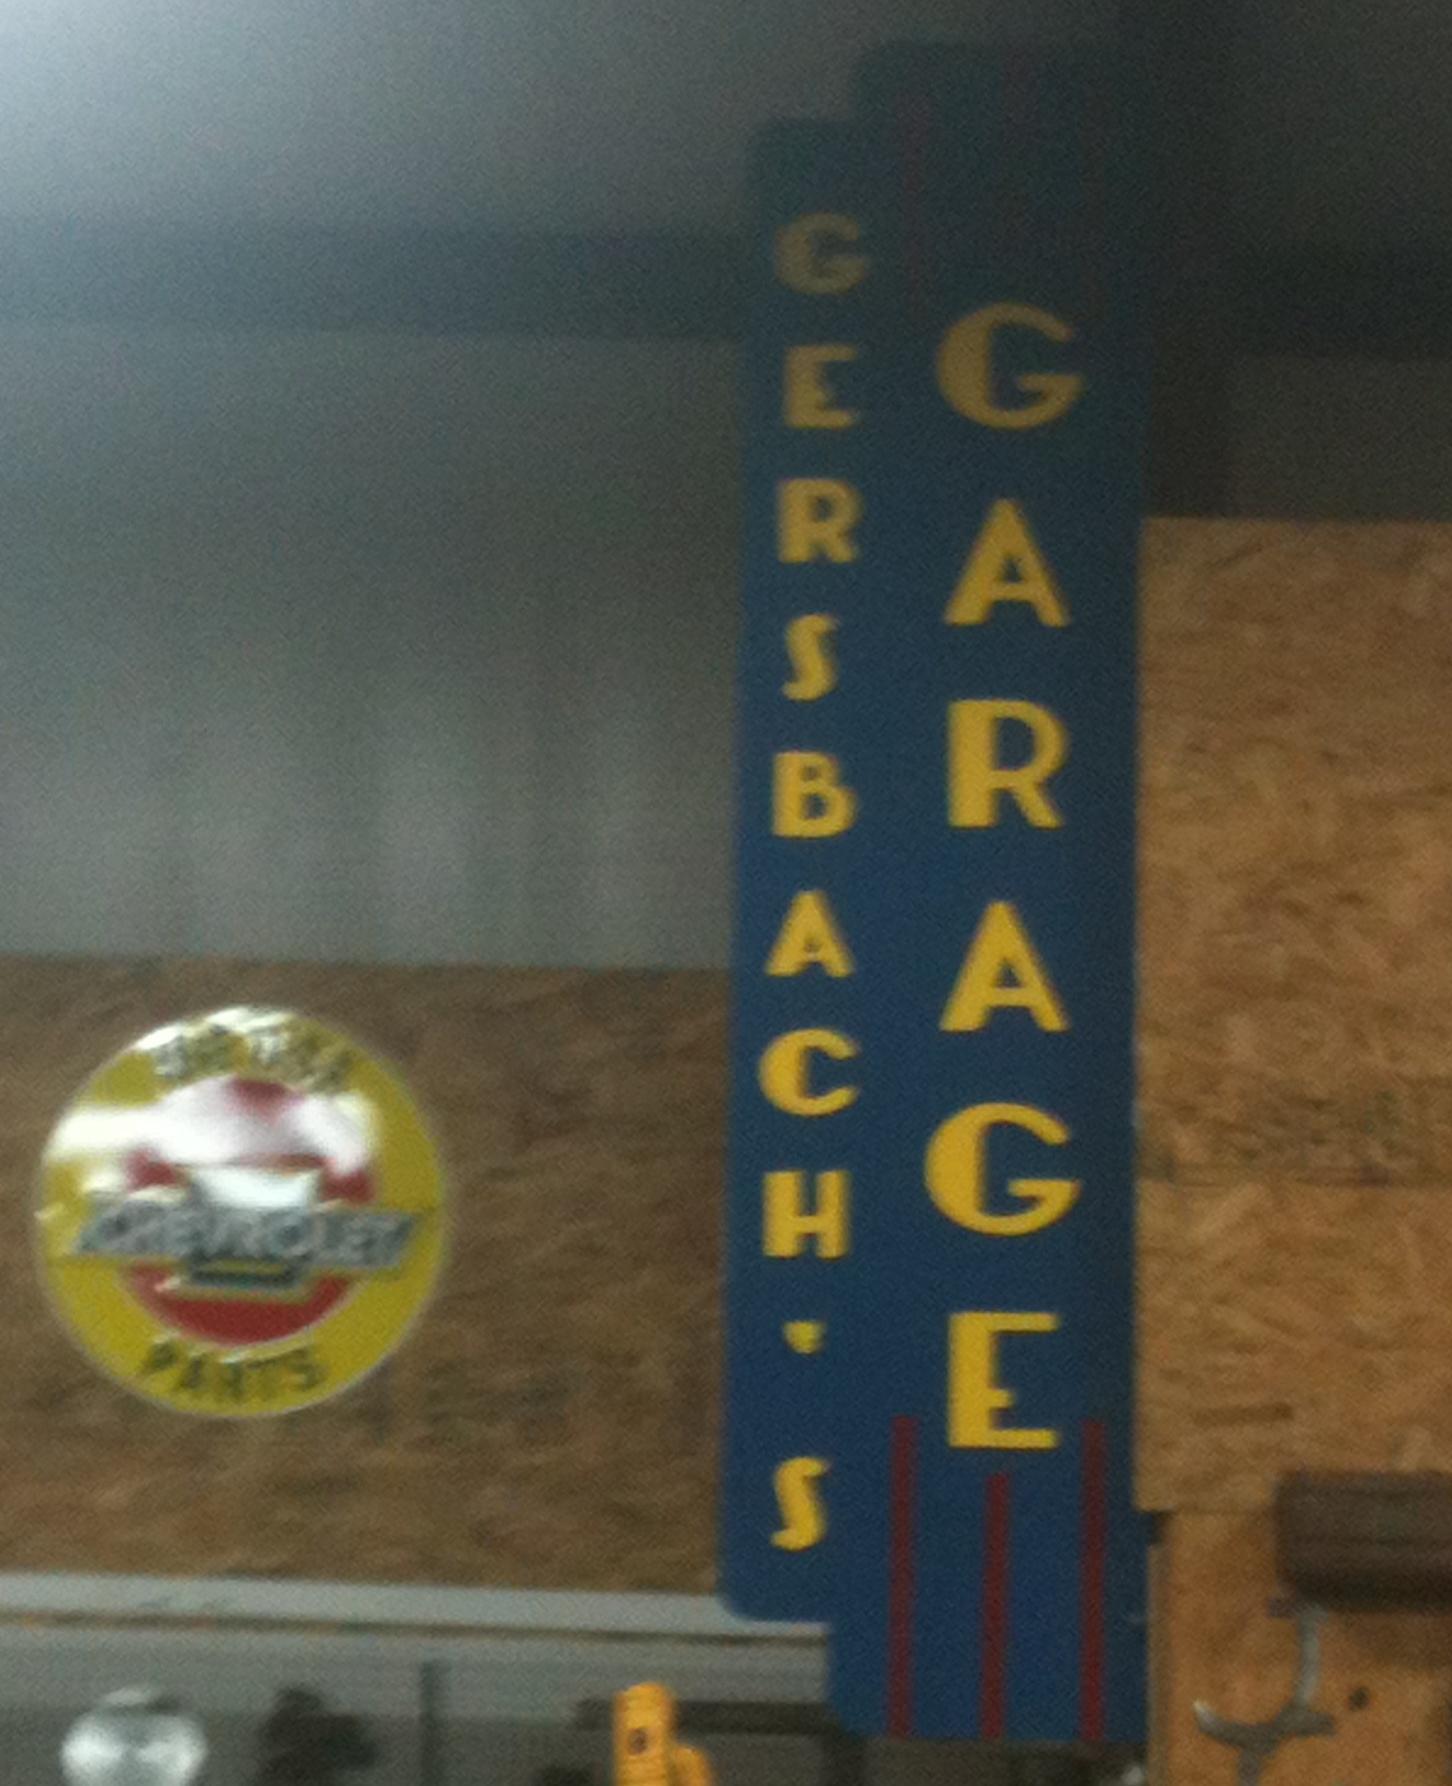 Click image for larger version  Name:gersbachs garage.jpg Views:243 Size:496.0 KB ID:72857